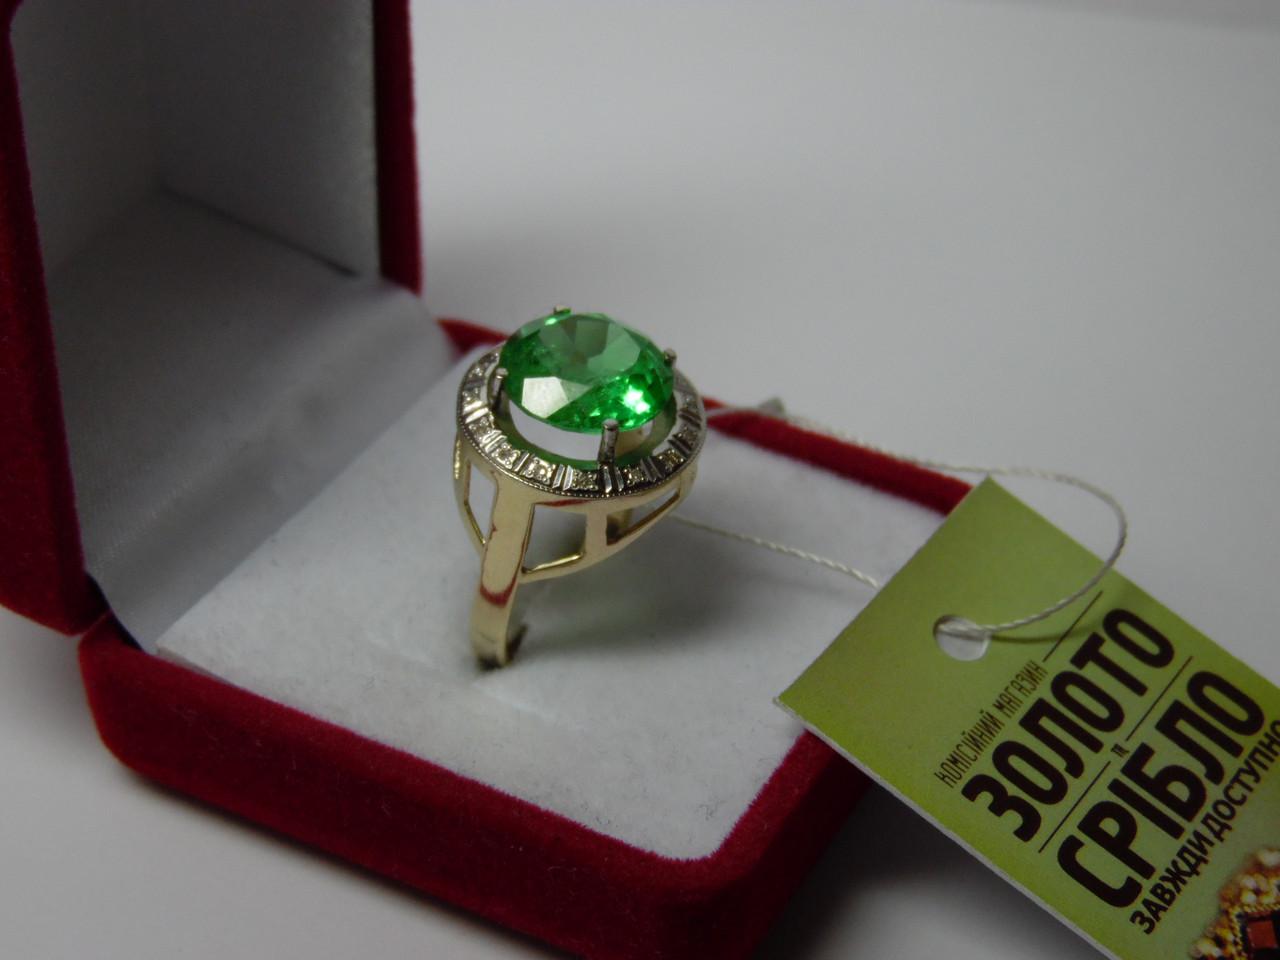 d116cd55f07a Золотое женское кольцо с бриллиантами. Размер 18,5  продажа, цена в ...